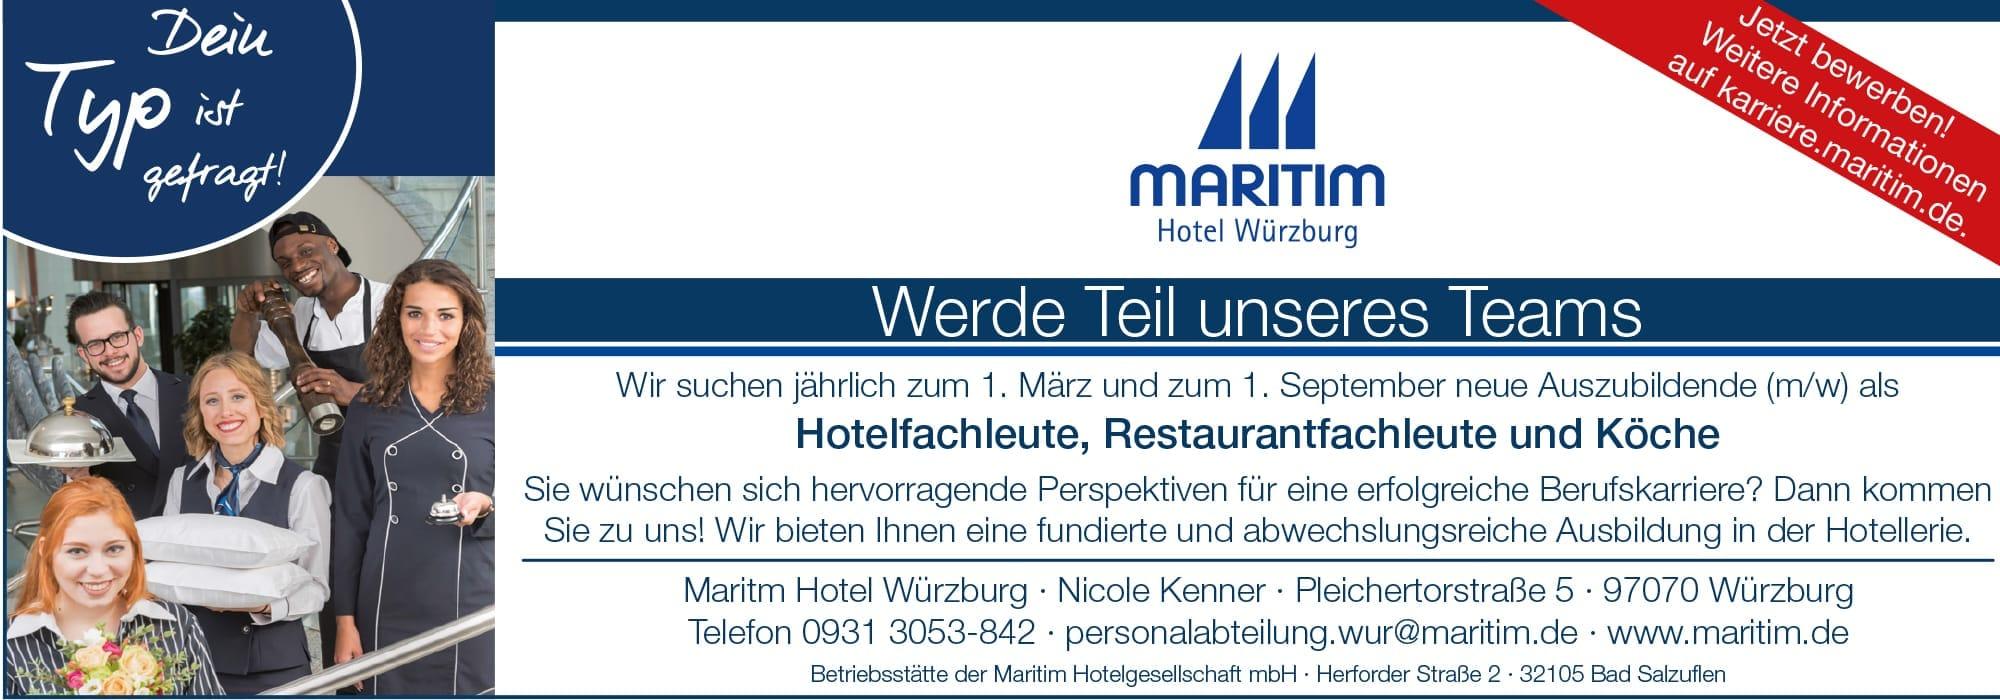 Maritim Hotelgesellschaft mbH / Maritim Hotel Würzburg